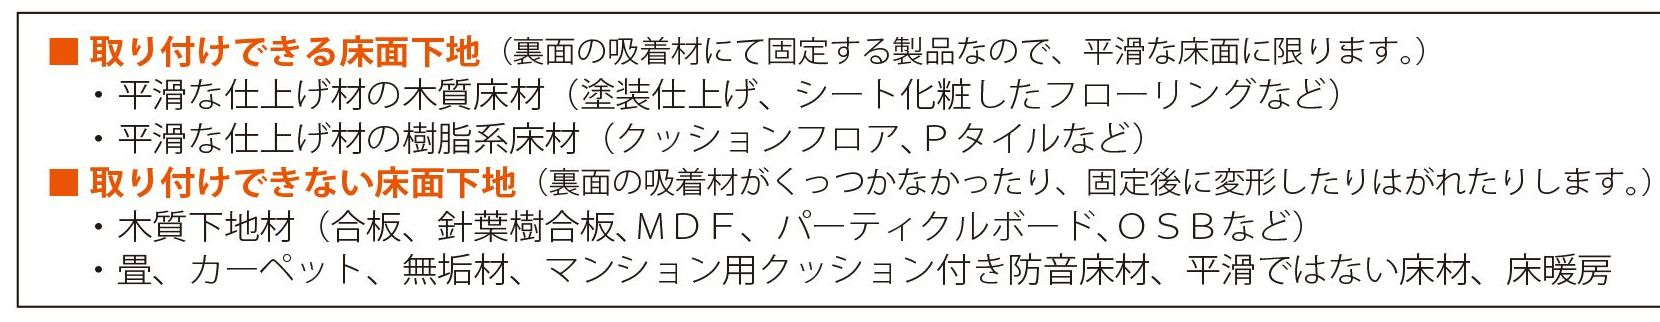 KuraSi-natu-sin101-0803.jpg